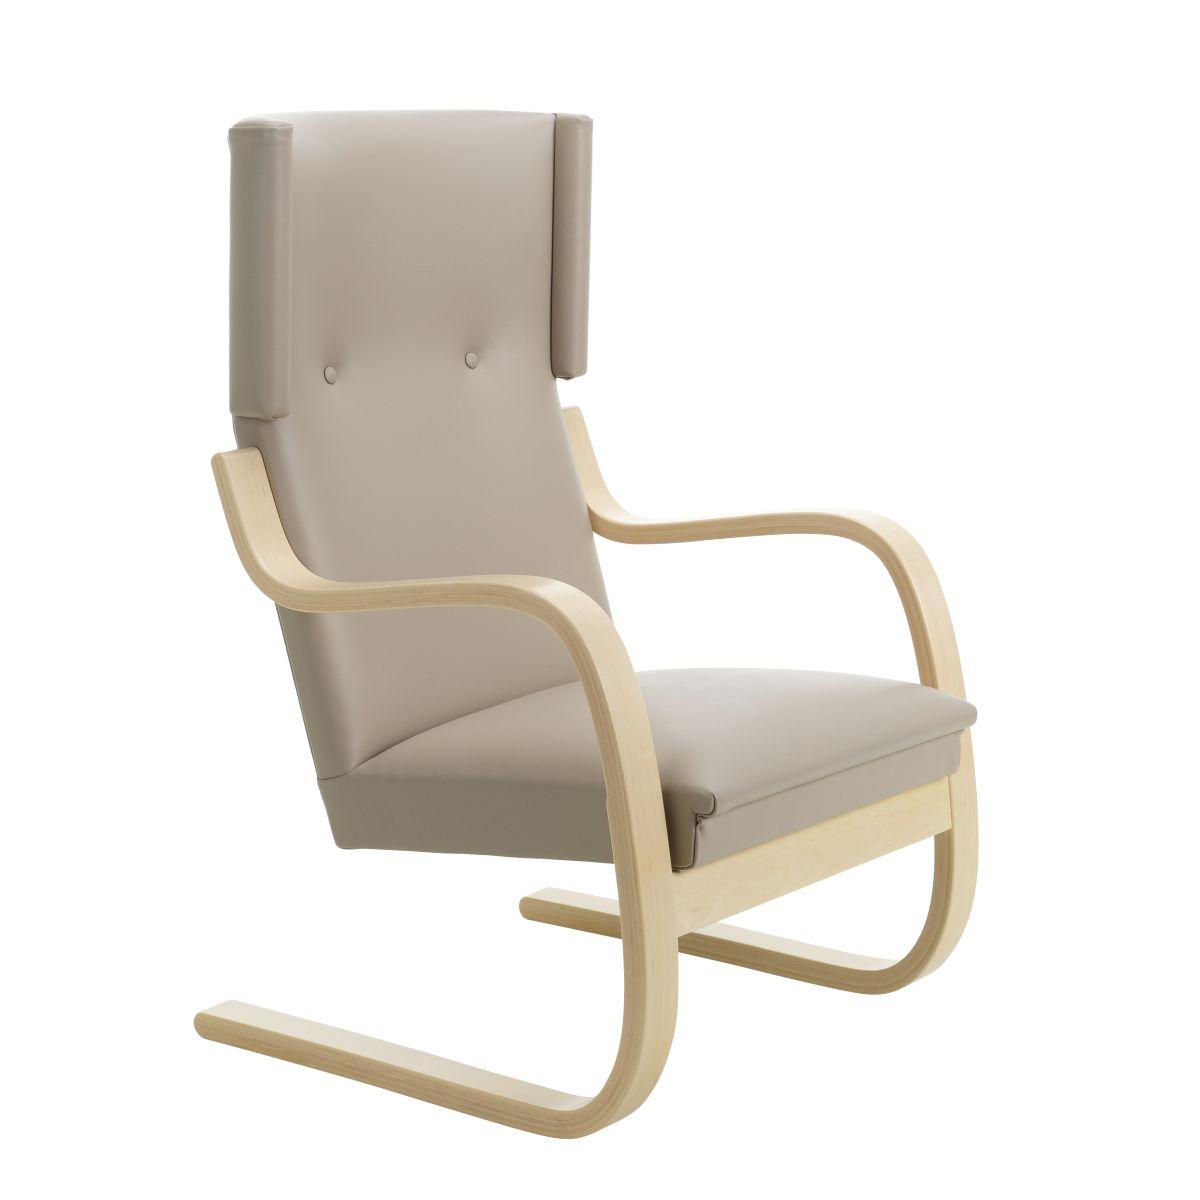 Armchair-401-natural-upholstery-Sörensen-Prestige-beige_F-2868260